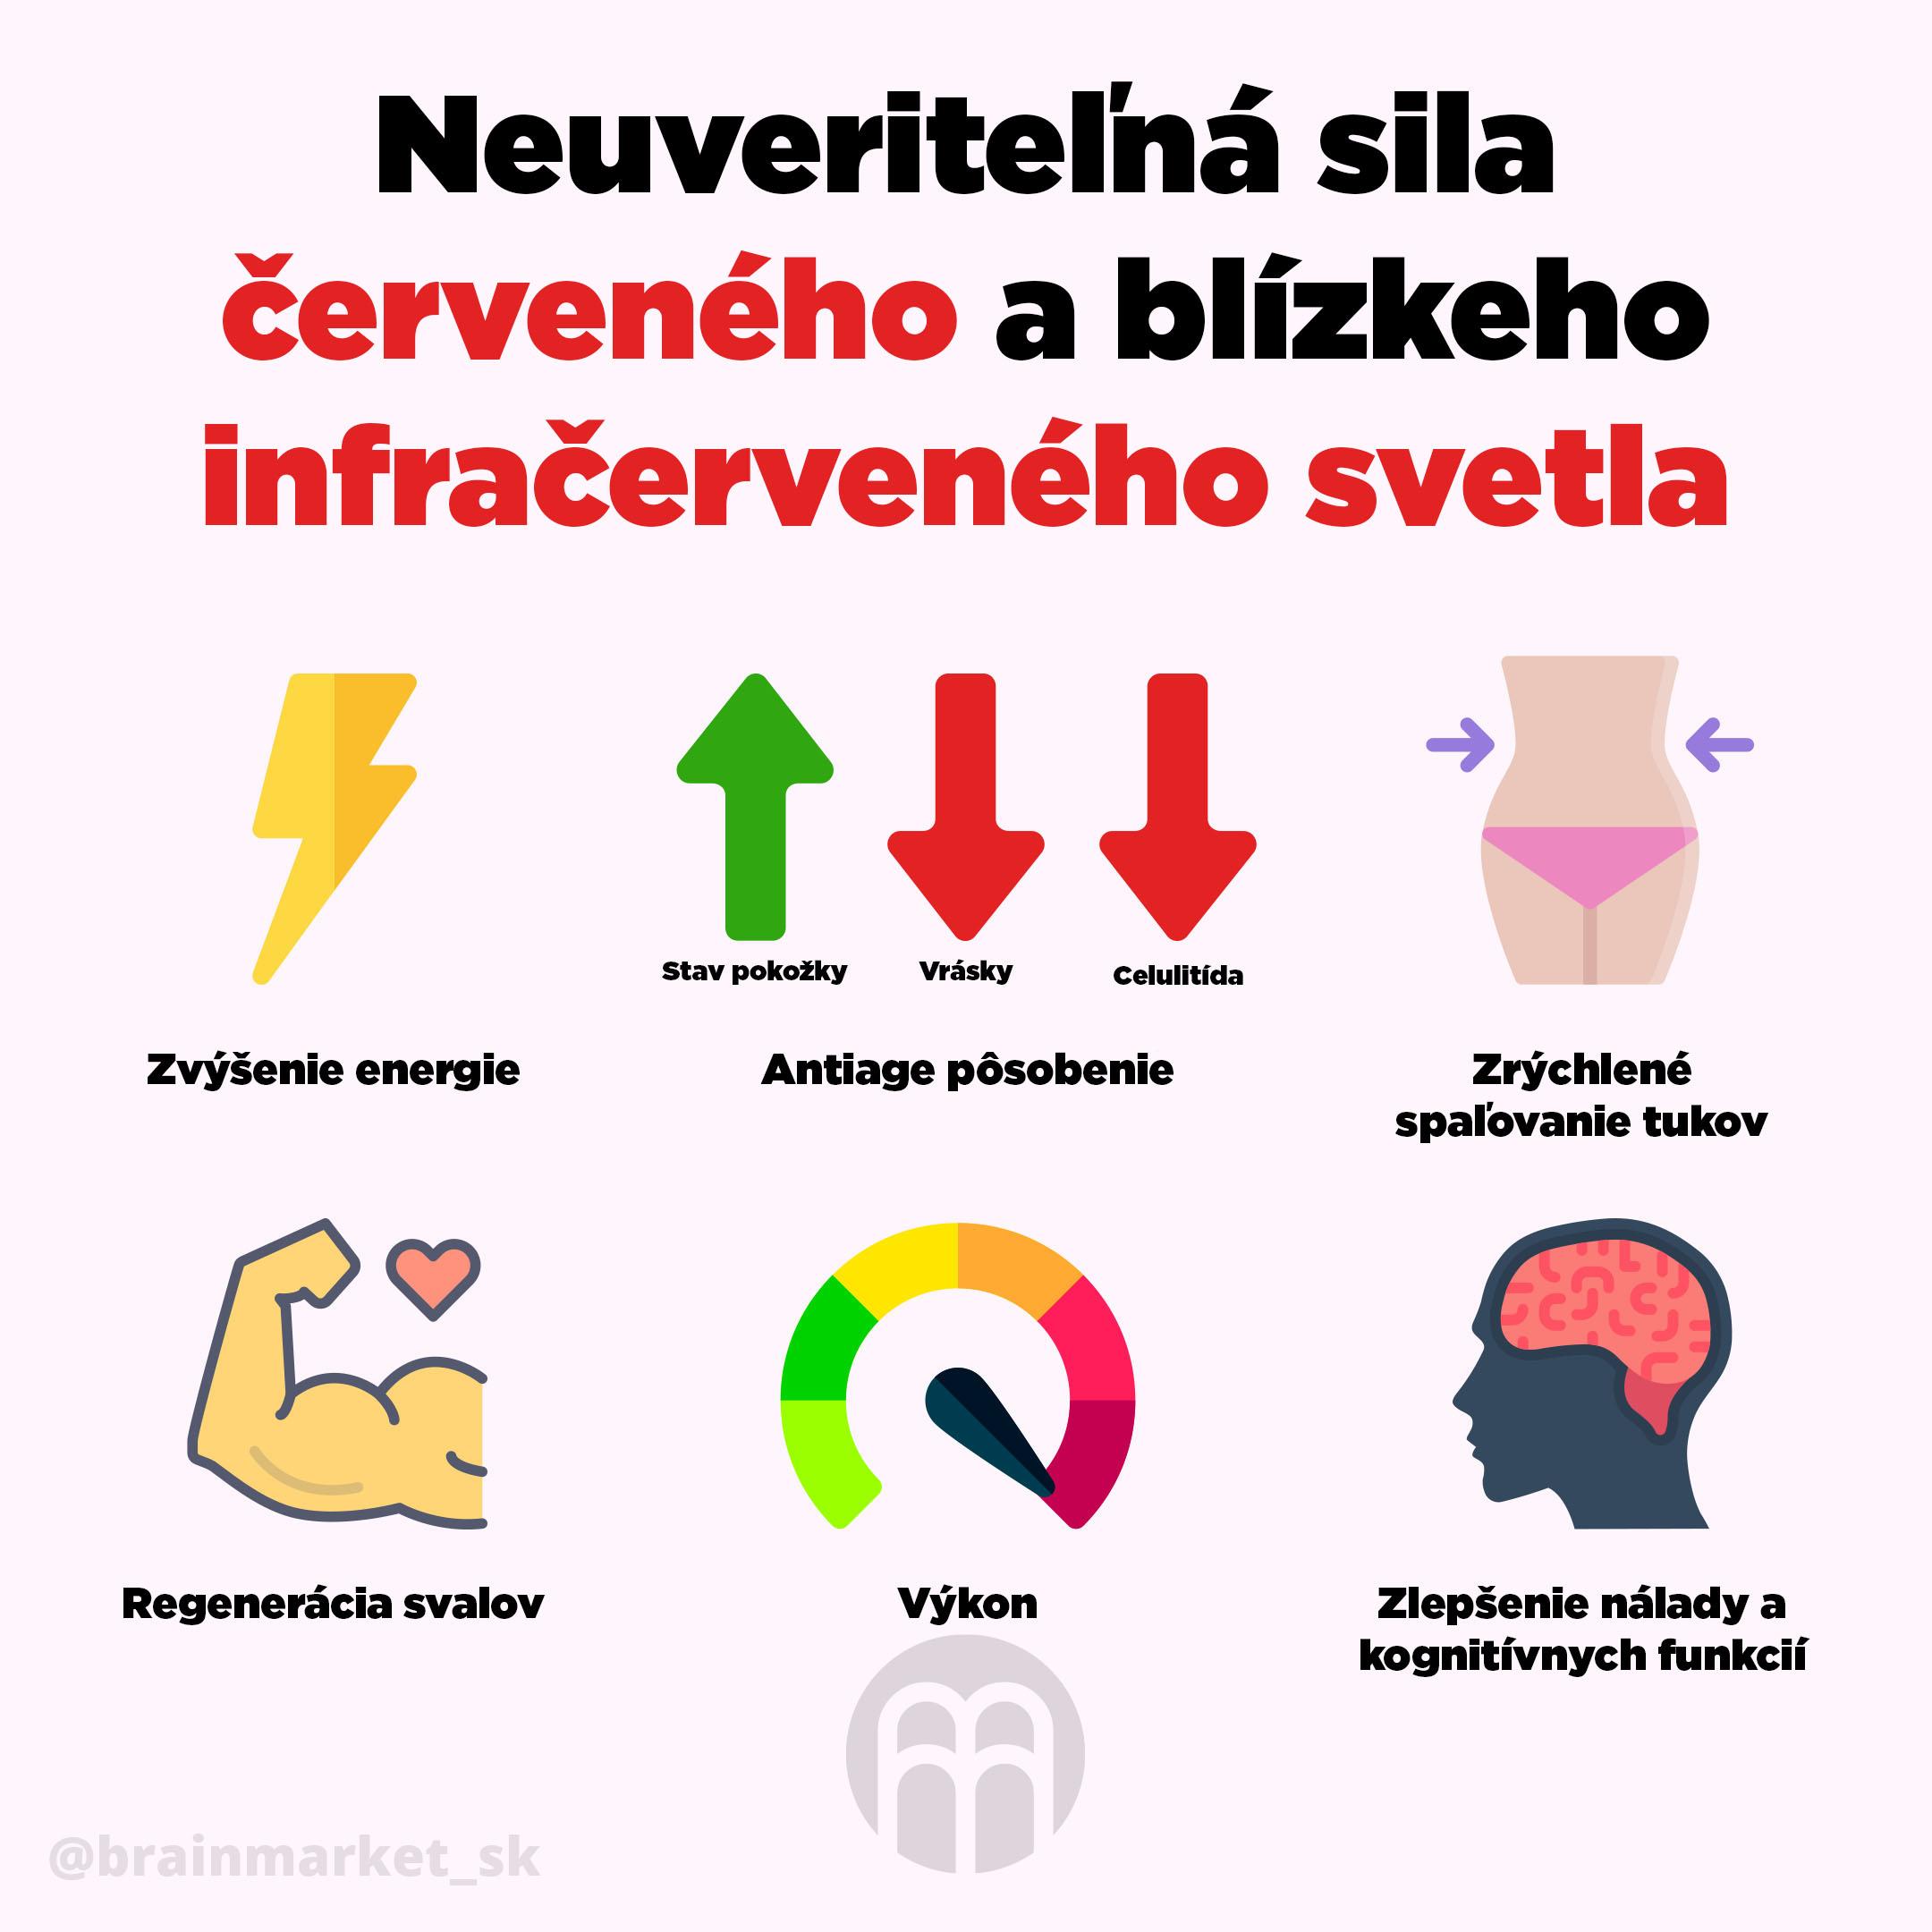 neuveritelna_sila_cerveneho_a_blizkeho_infracerveneho_svetla_infografika_brainmarket_SK